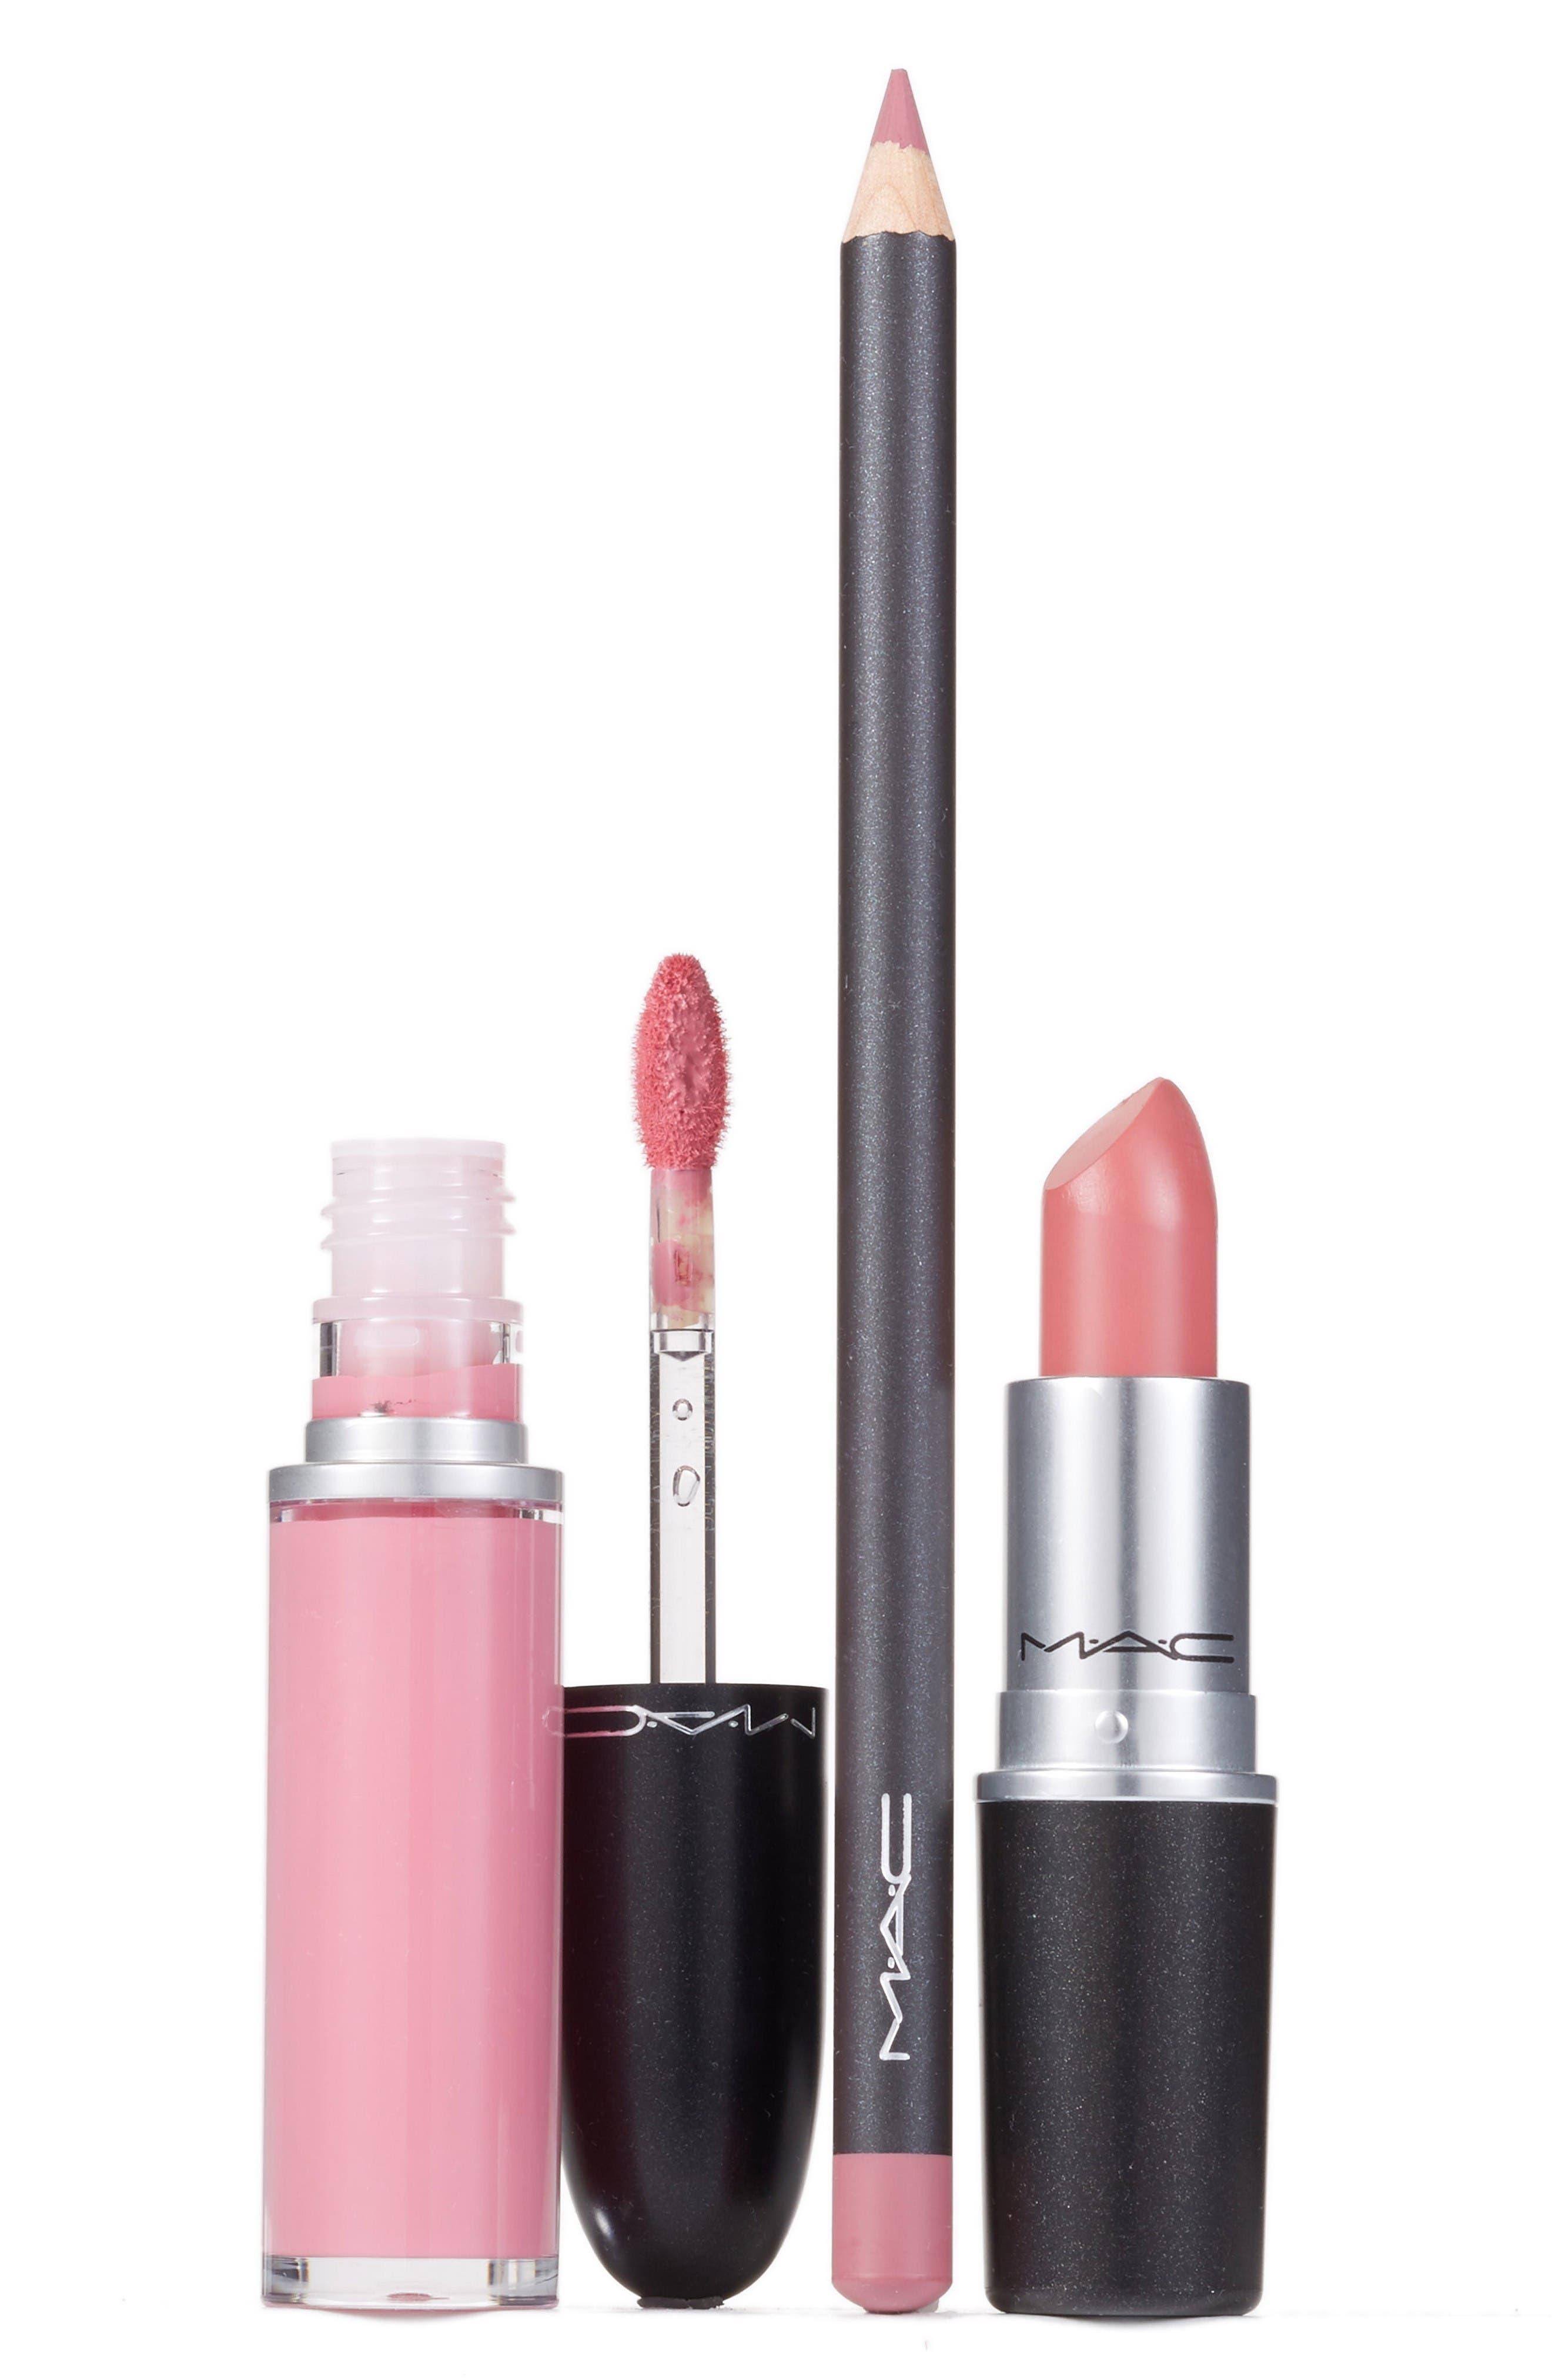 Makeup Sets U0026 Makeup Kits | Nordstrom